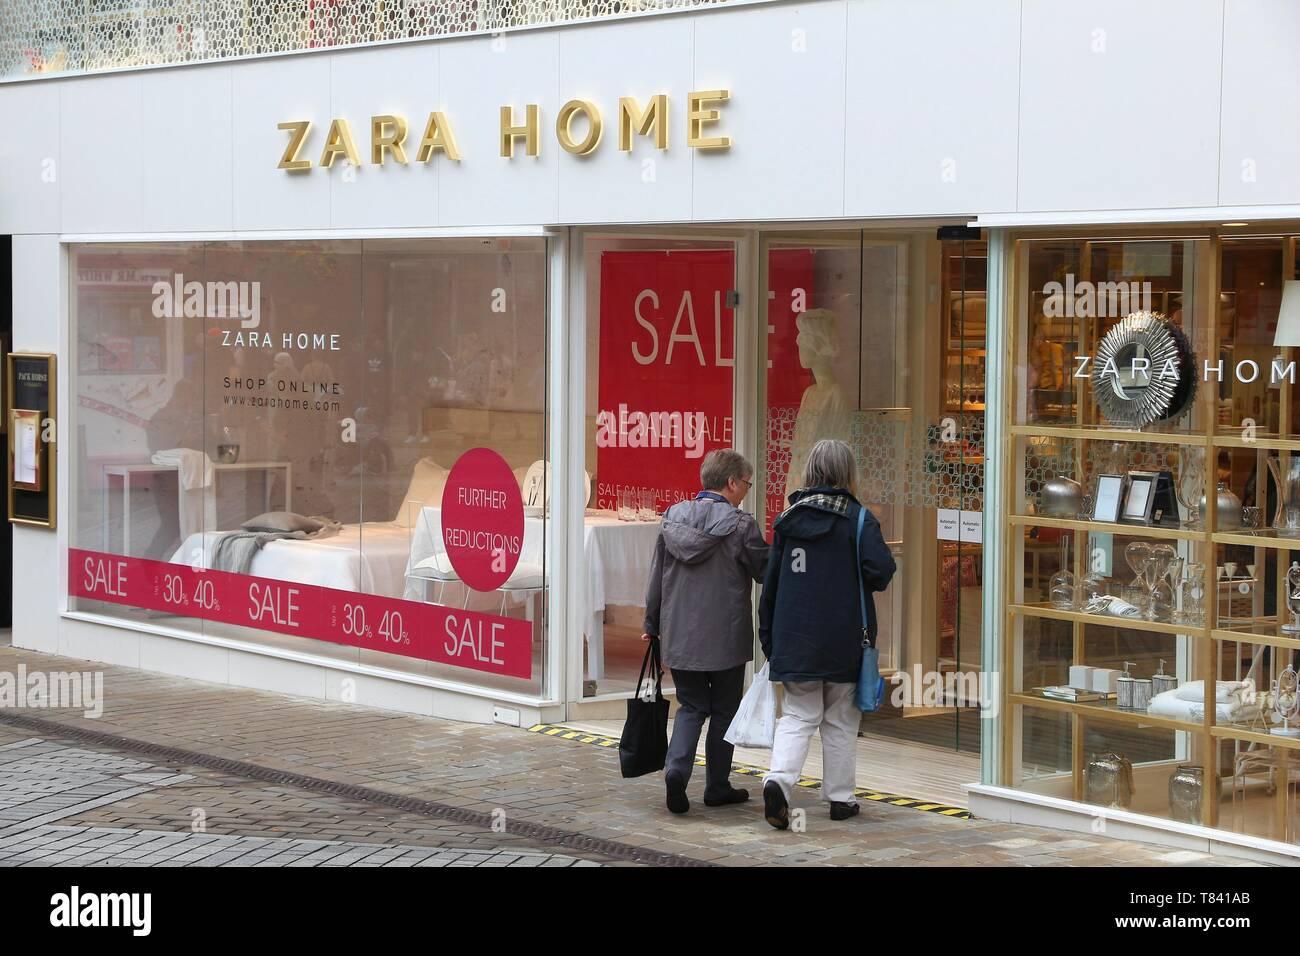 5935db3d Zara Home Shop Business Stock Photos & Zara Home Shop Business Stock ...